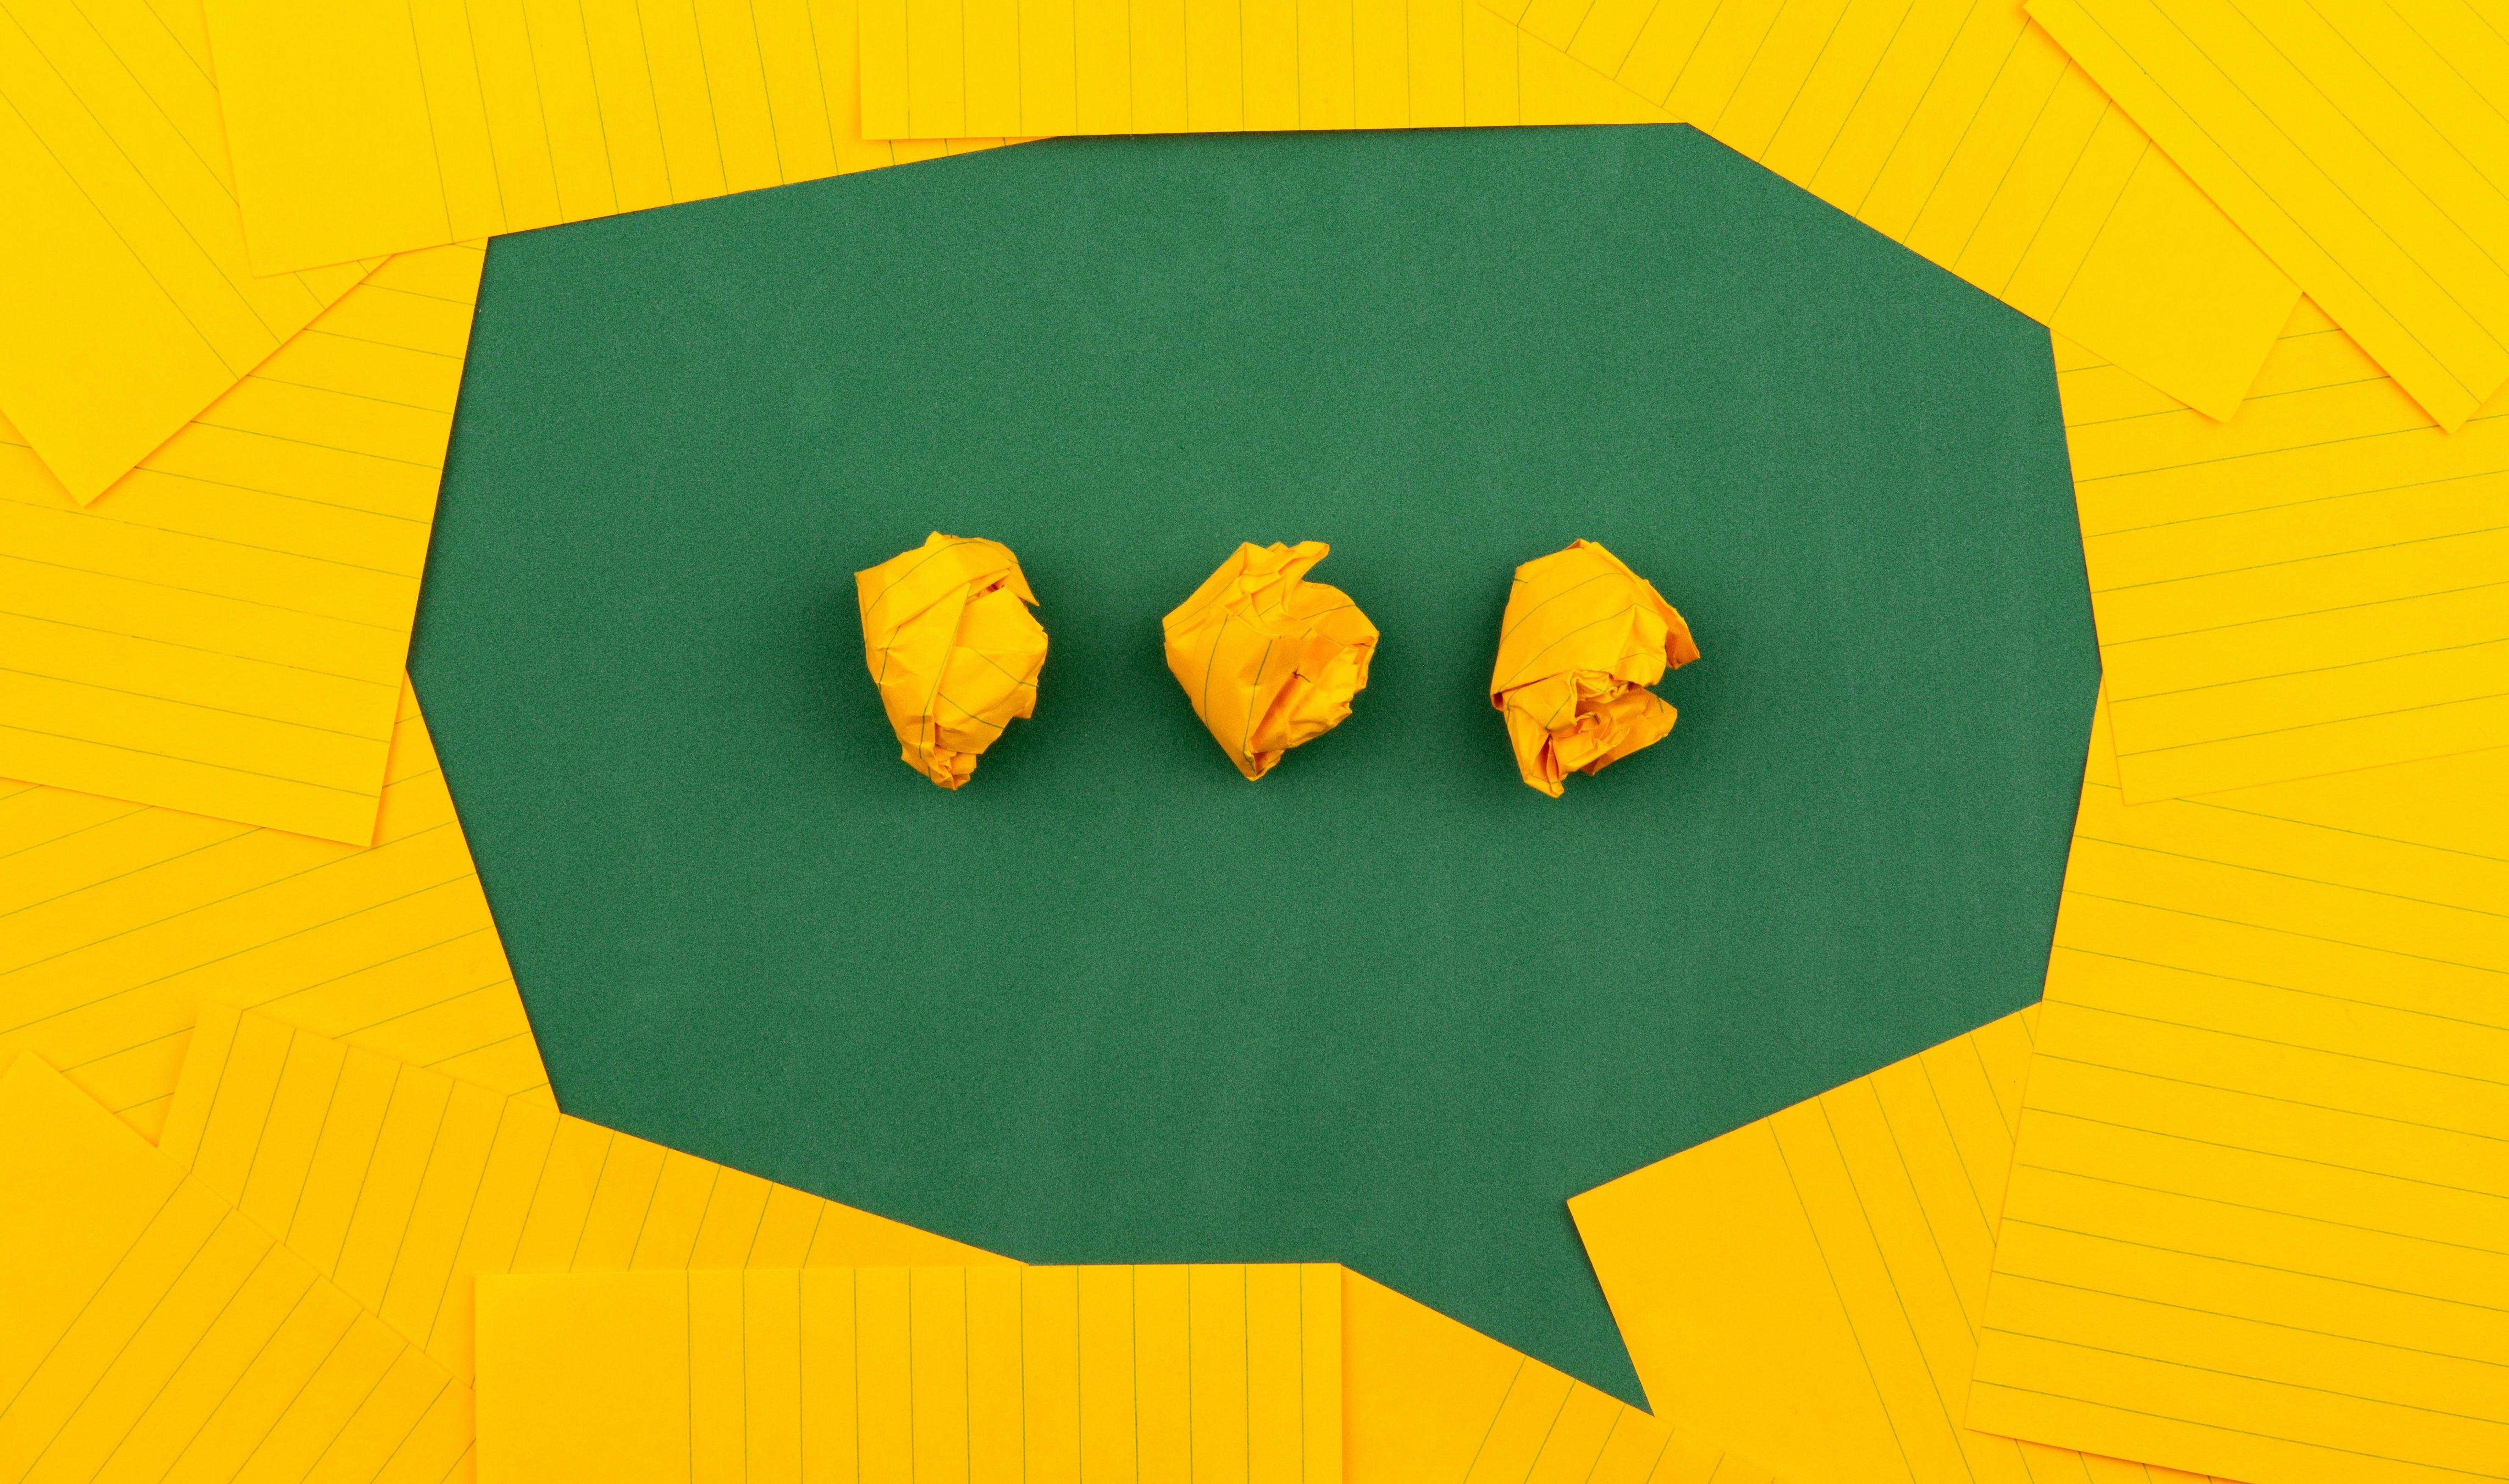 5 Ways To Encourage Communication Skills During COVID-19